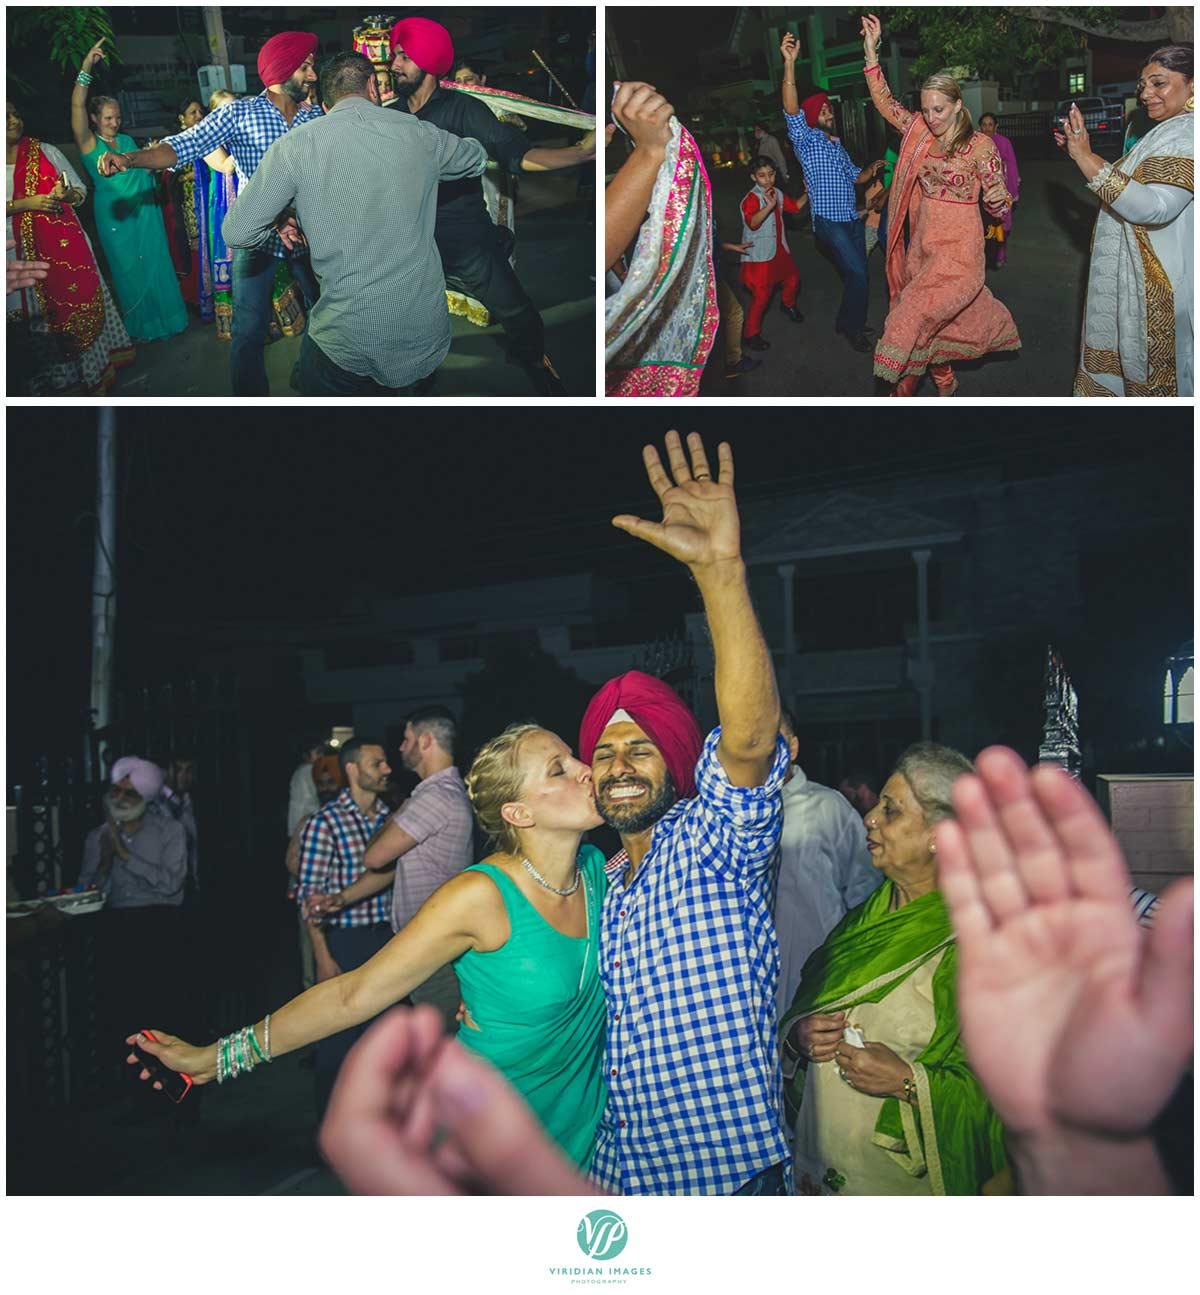 India_Chandigarh_Sangeet_Viridian_Images_Photography_poto_14